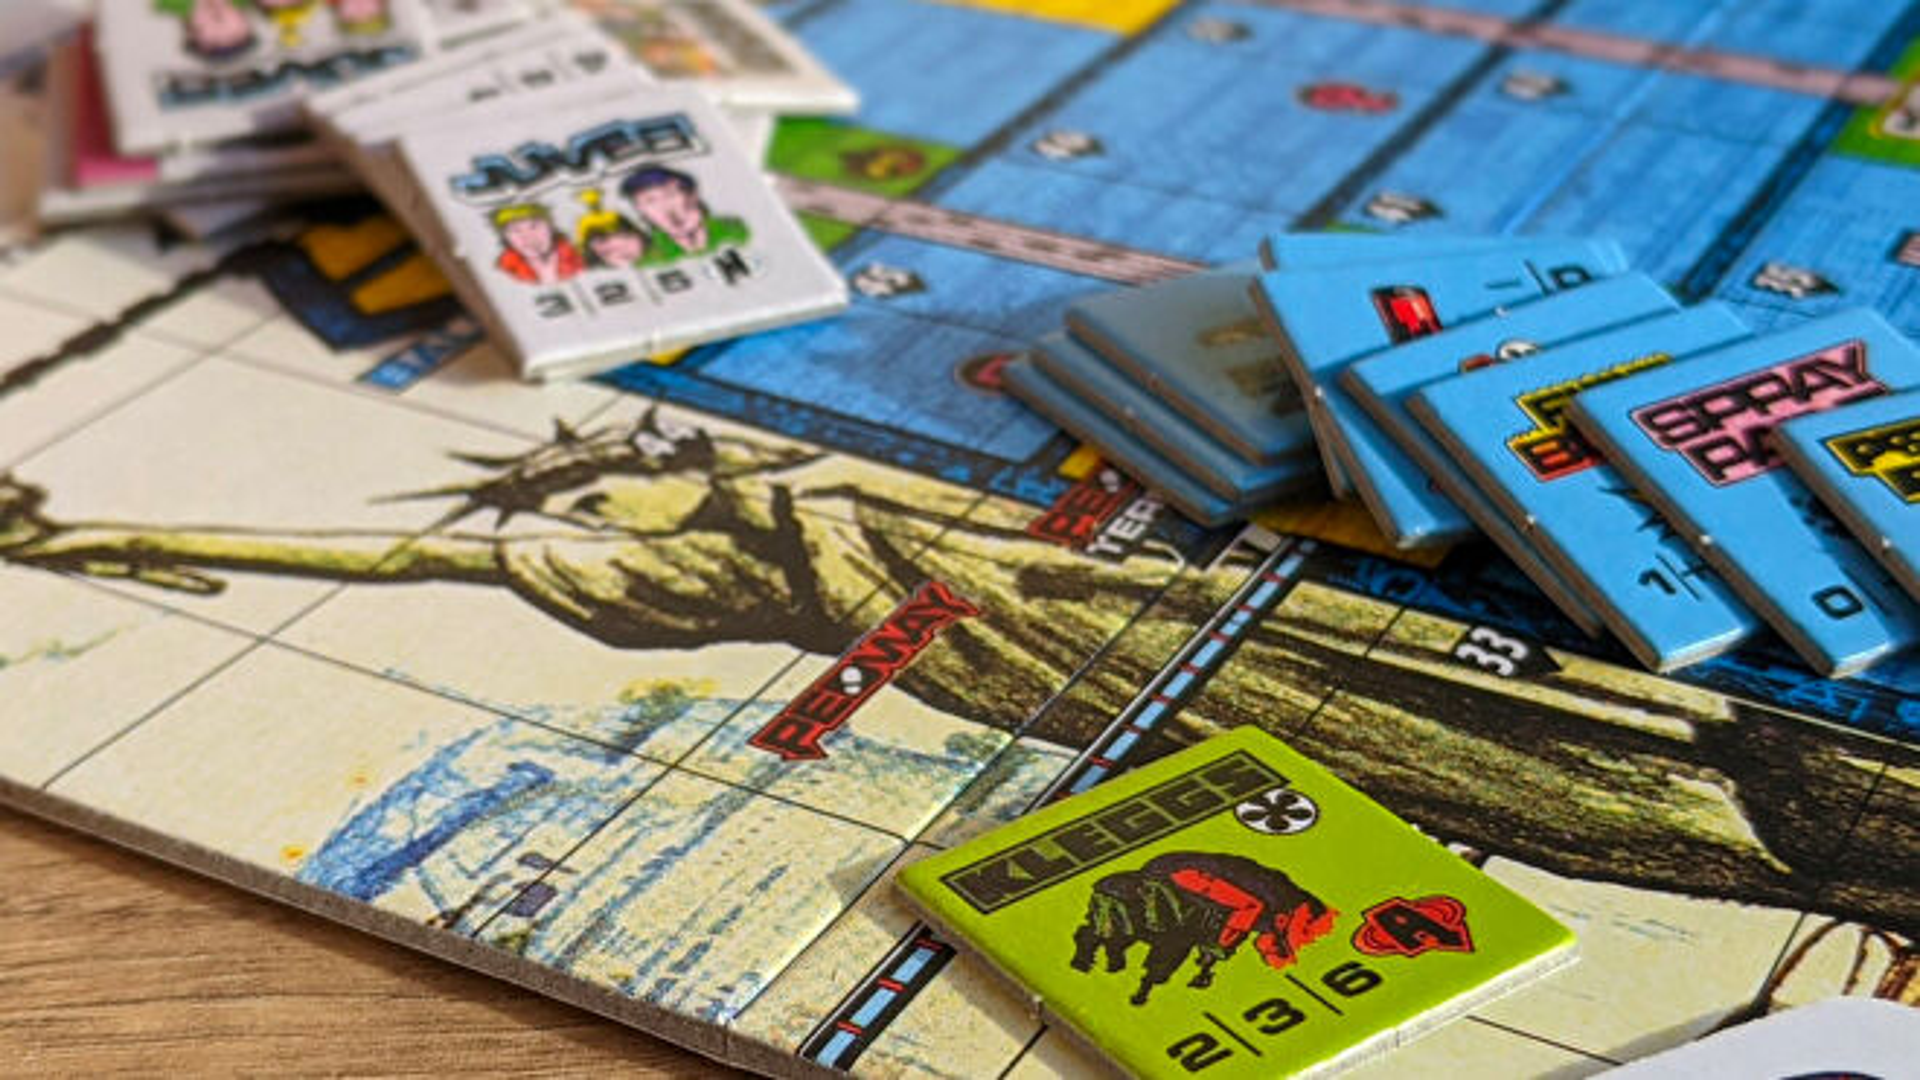 block-mania-board-game-tokens.jpg